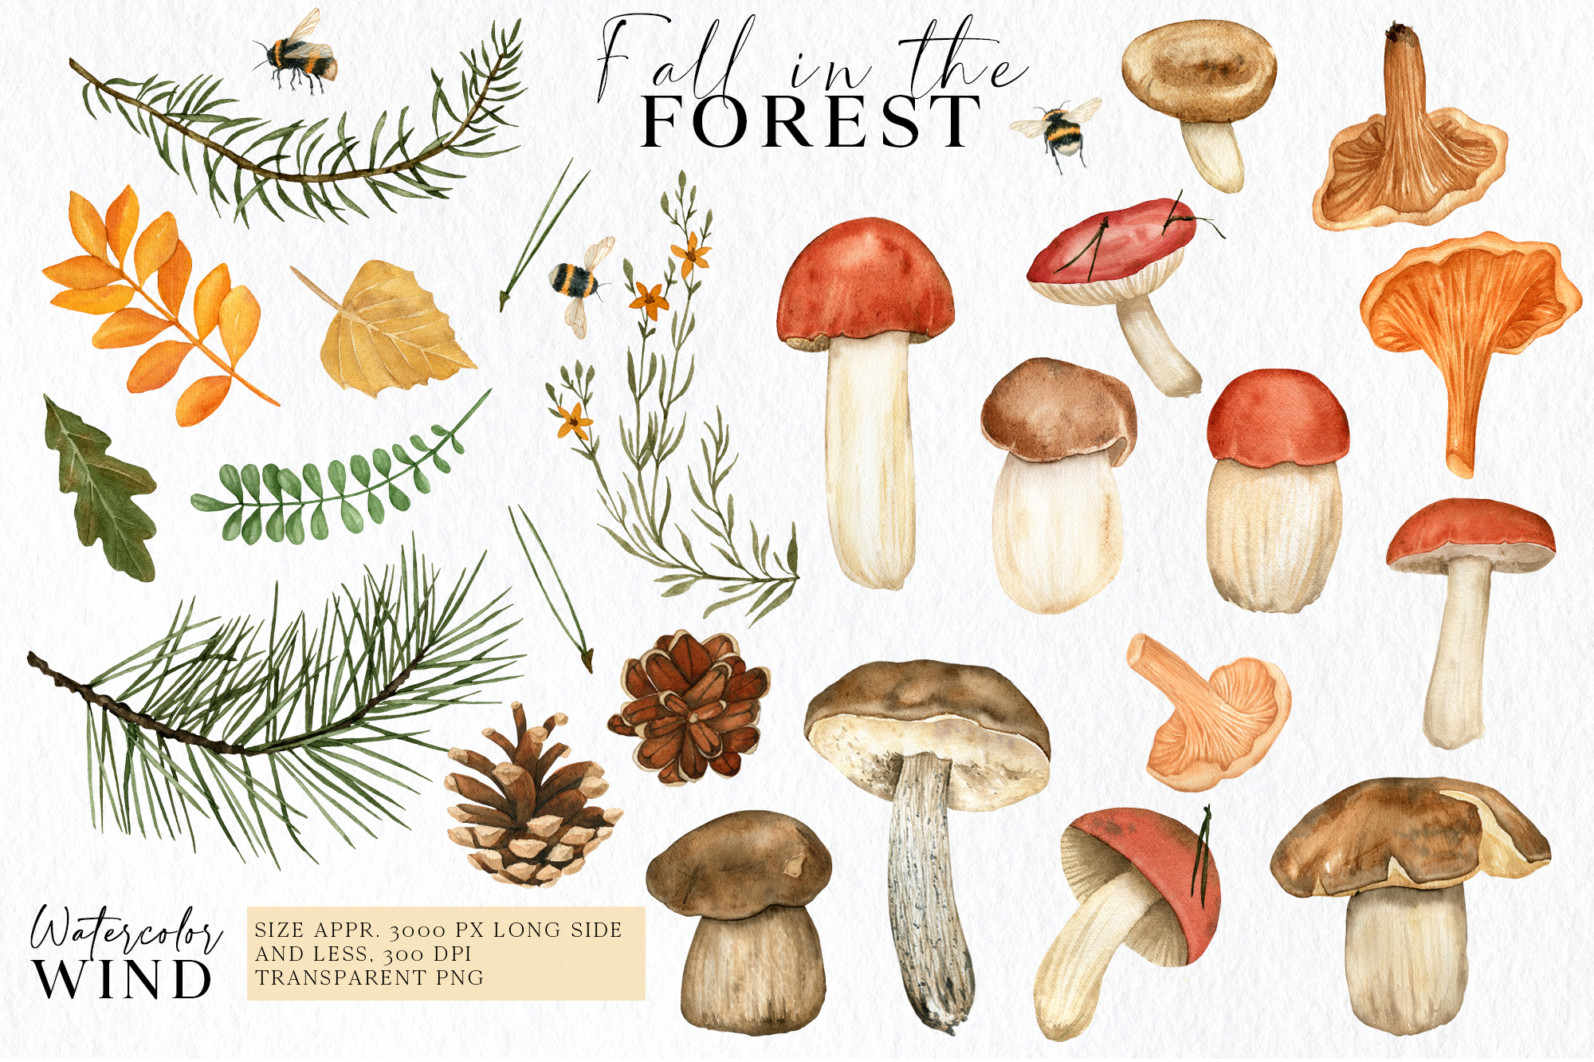 Fall forest mushrooms clipart, autumn clip art - 01 14 -